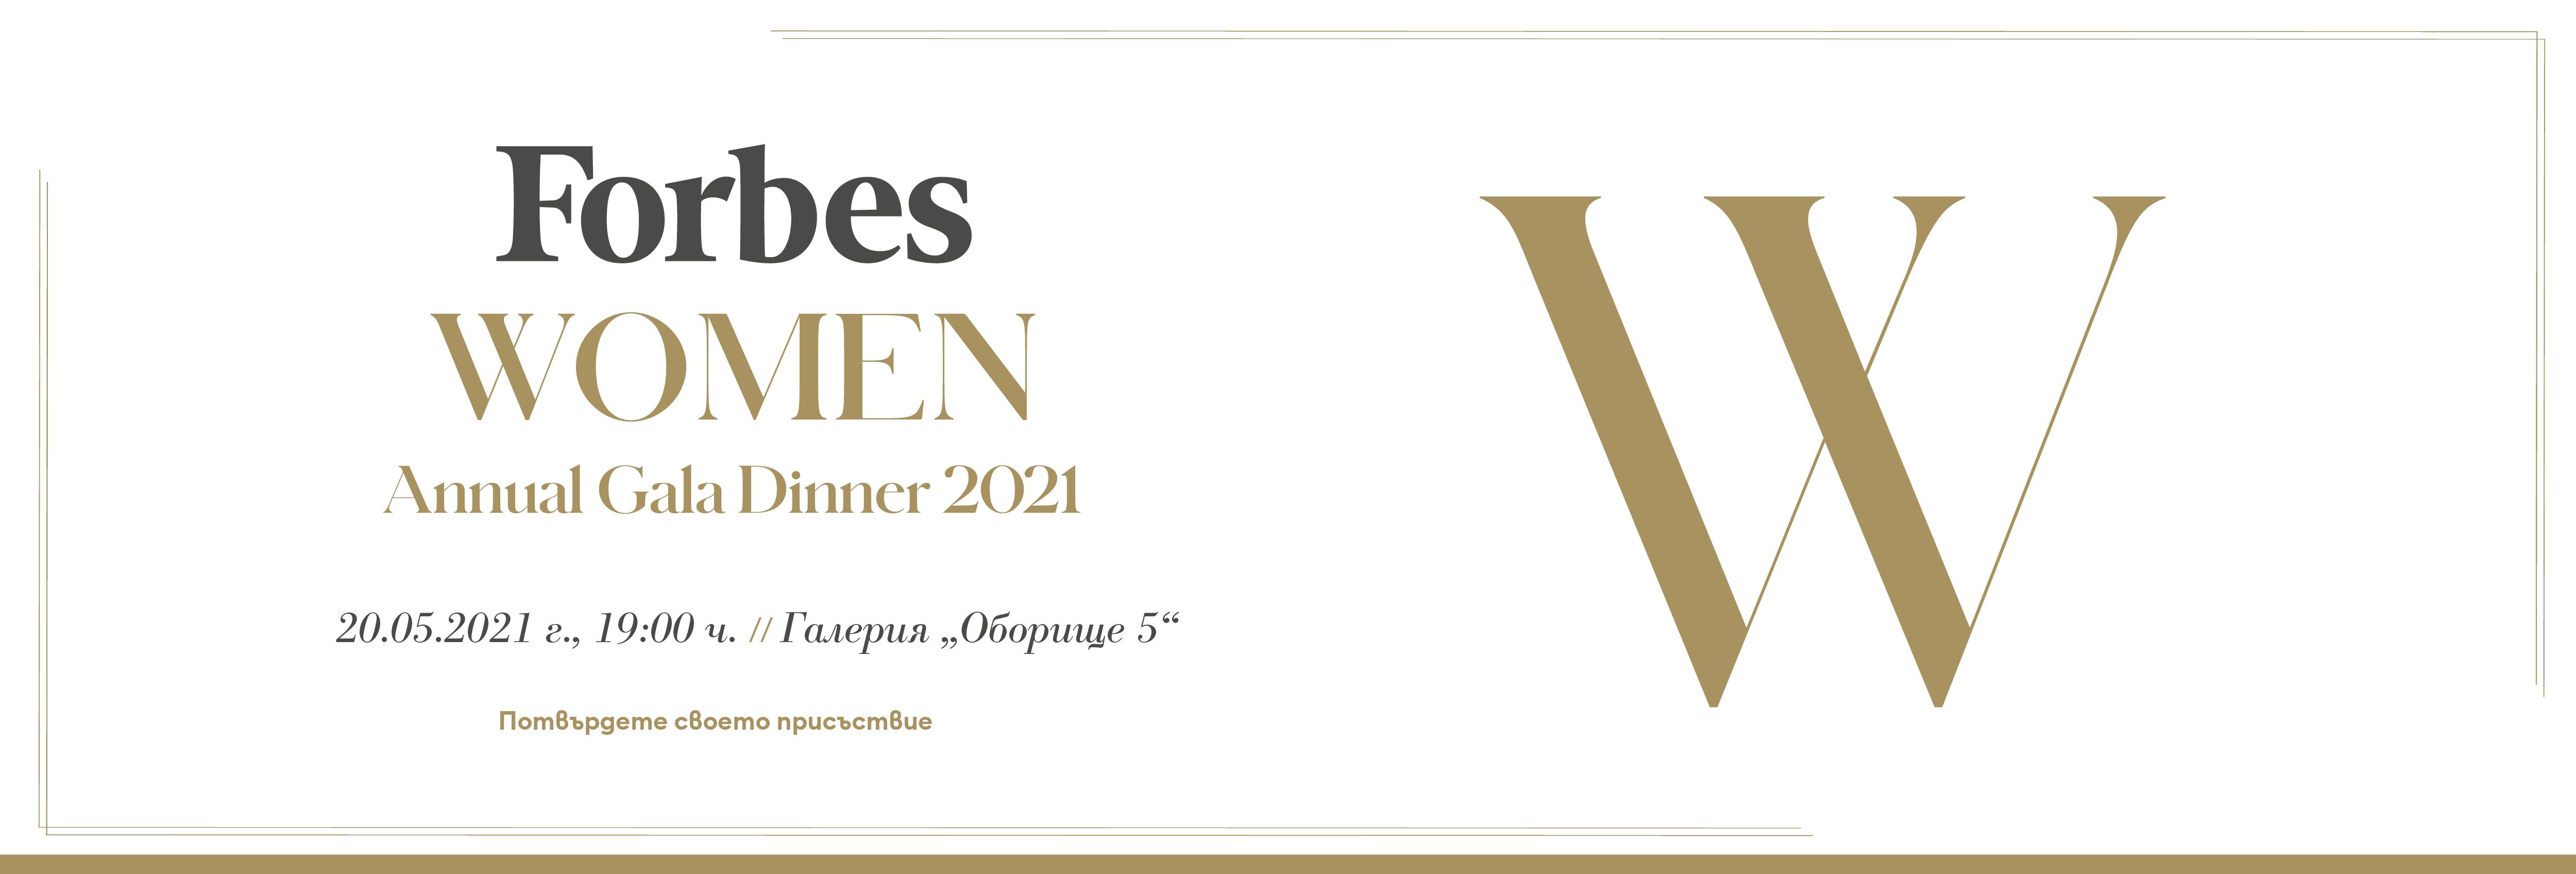 Invitation_ForbesWoman_2021_v2